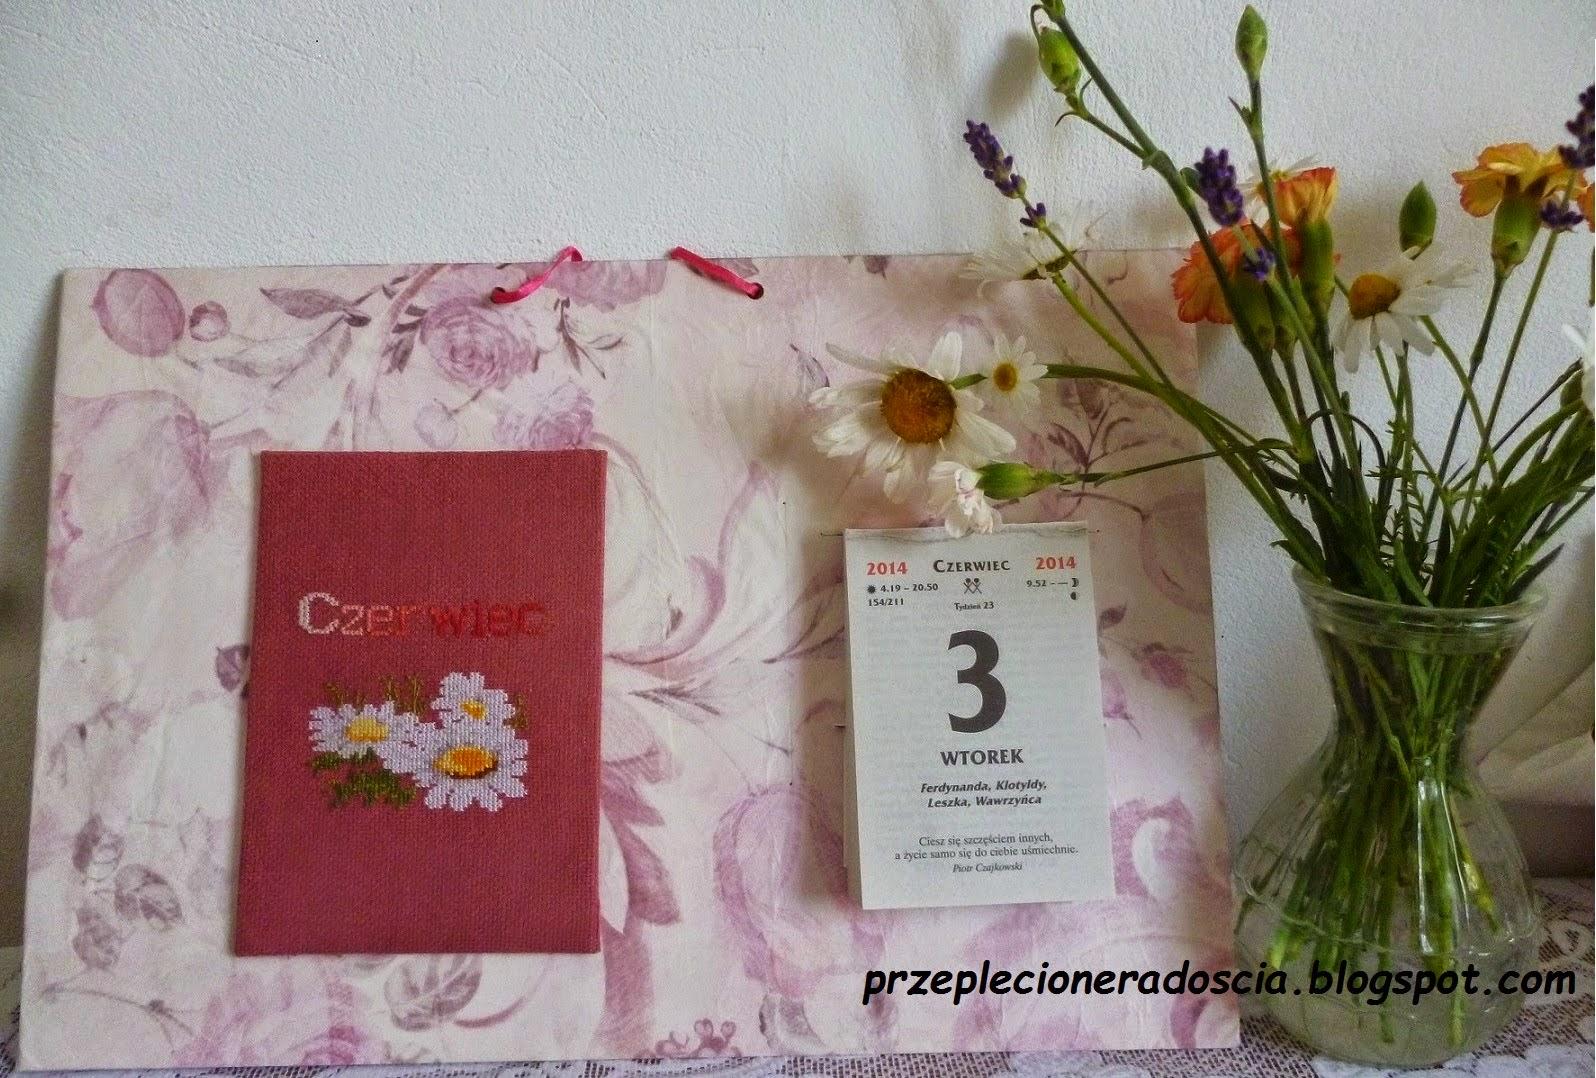 http://przeplecioneradoscia.blogspot.ru/2014/06/sal-cz-6.html